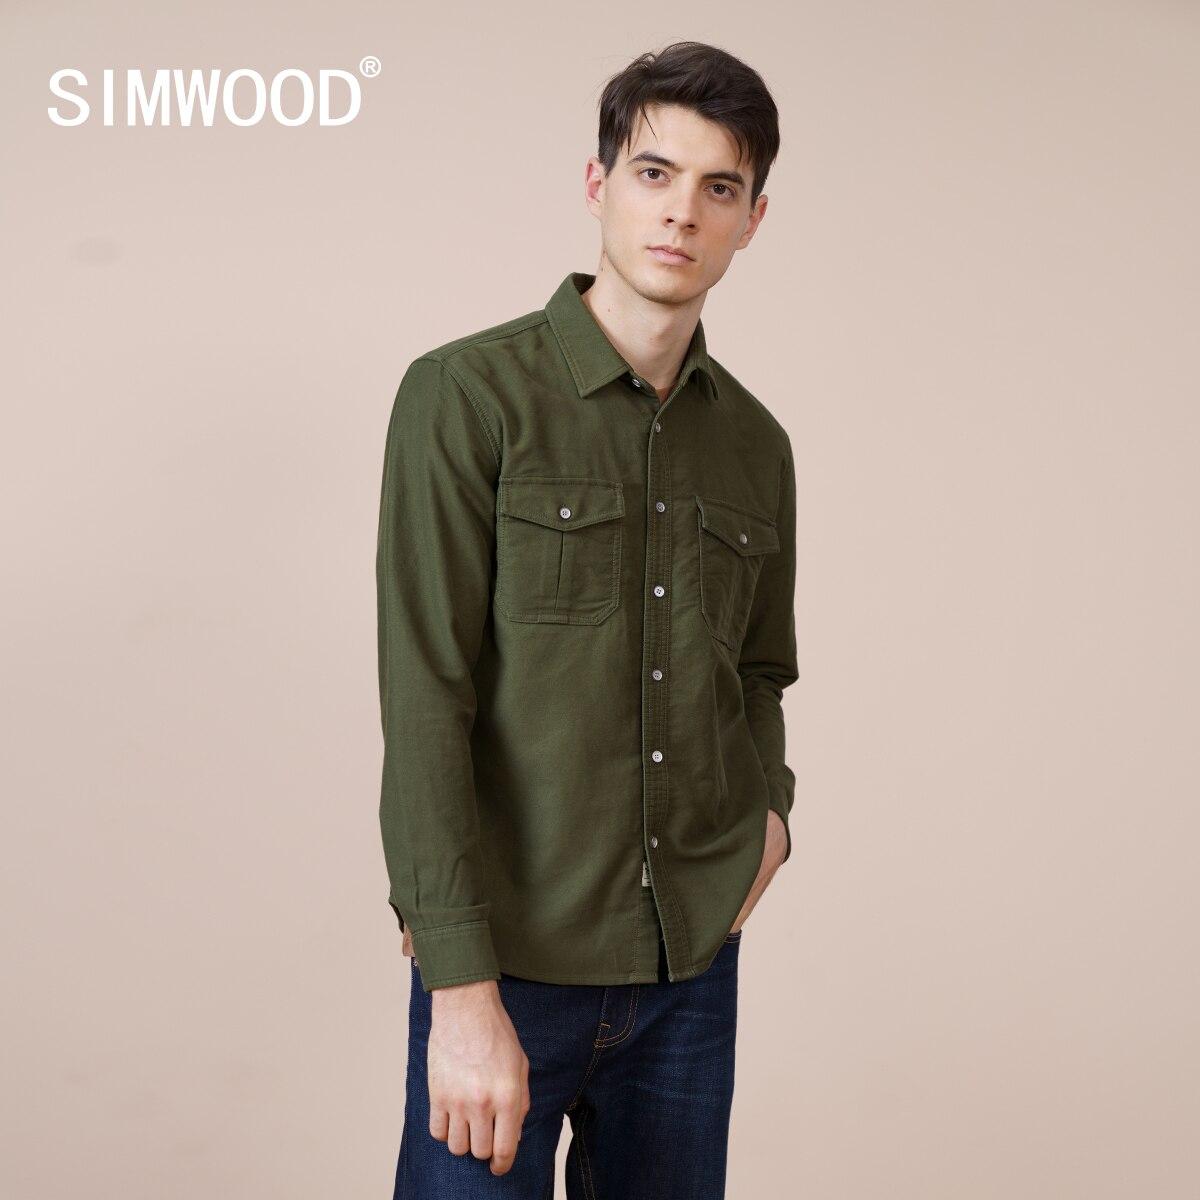 SIMWOOD-قميص كارغو غربي 2021 قطن للرجال ، مقاس كبير ، ملابس ذات علامة تجارية عالية الجودة ، مجموعة ربيع جديدة 100% ، SK130175